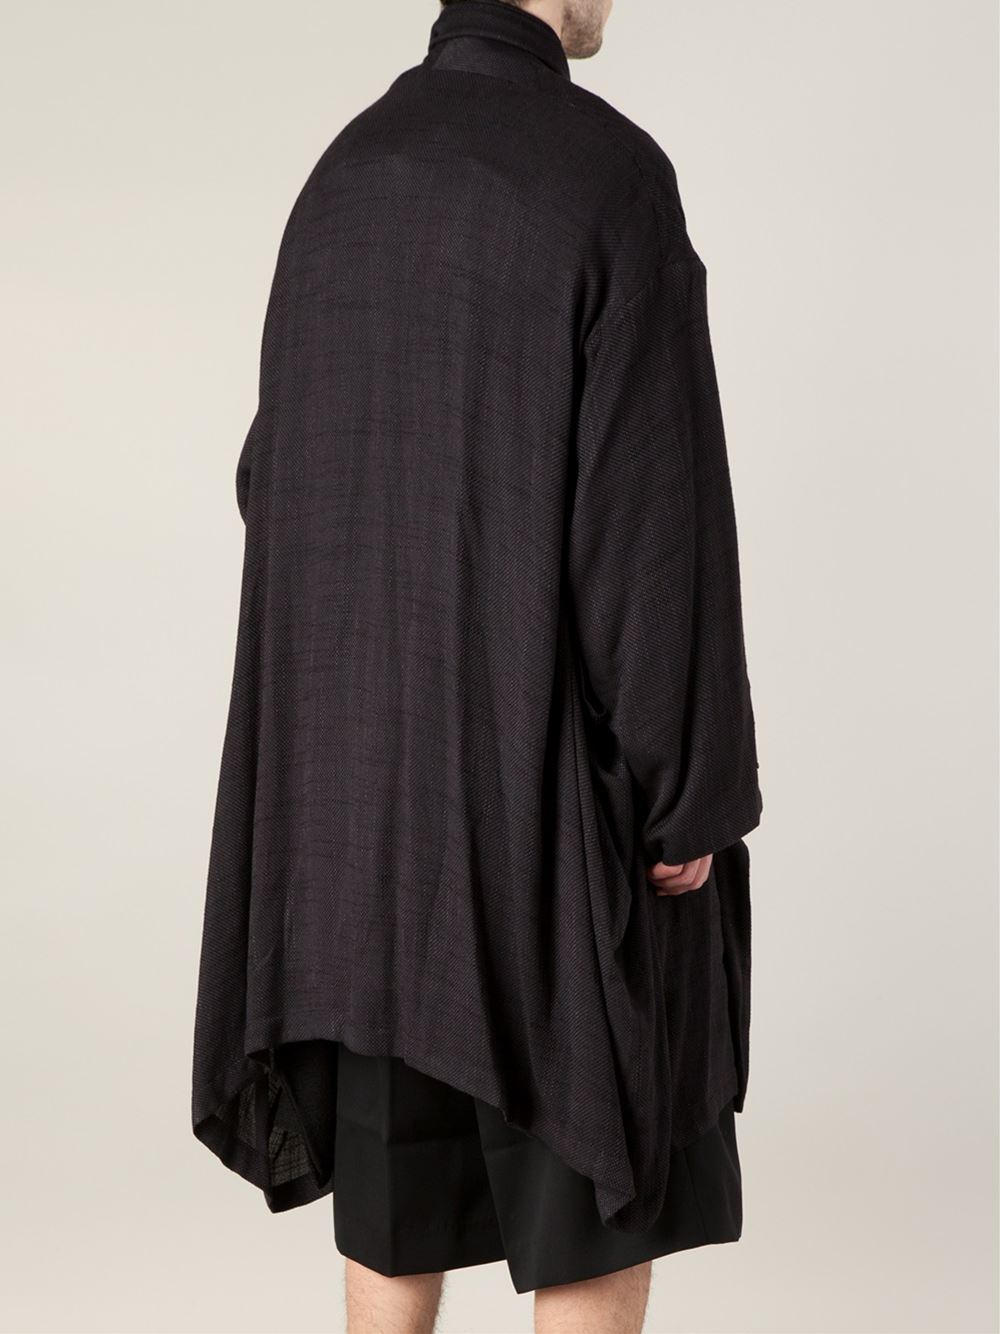 Yohji Yamamoto Draped Coat In Black For Men Lyst